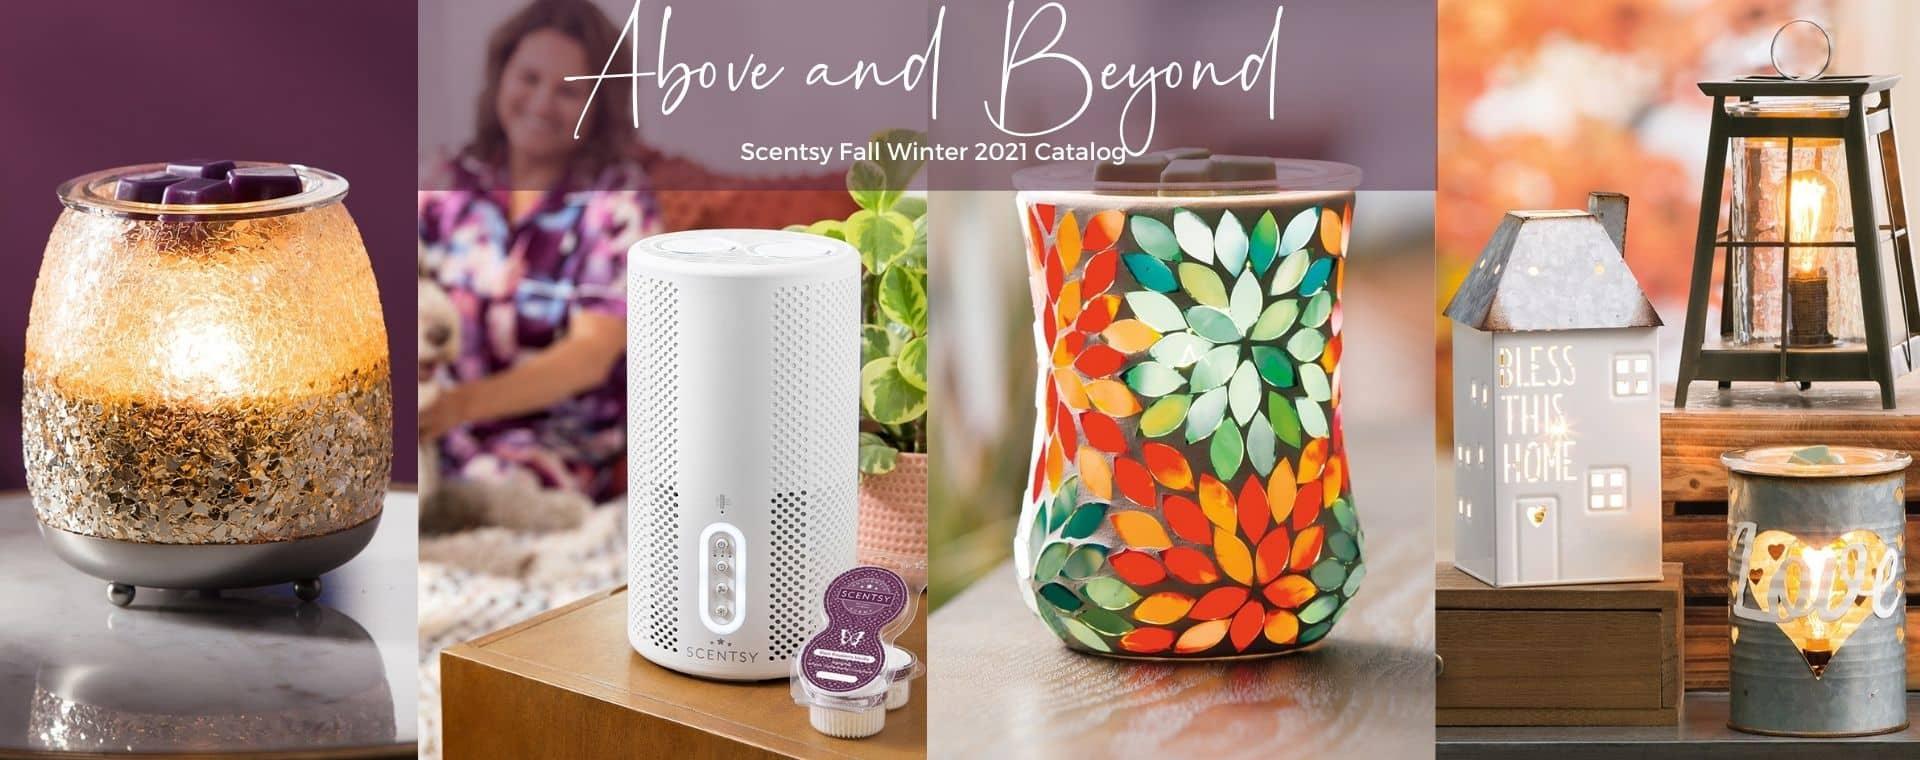 Scentsy Fall 2021 Catalog 1 1 | New! Scentsy 2021 Fall Winter Catalog | Shop Now